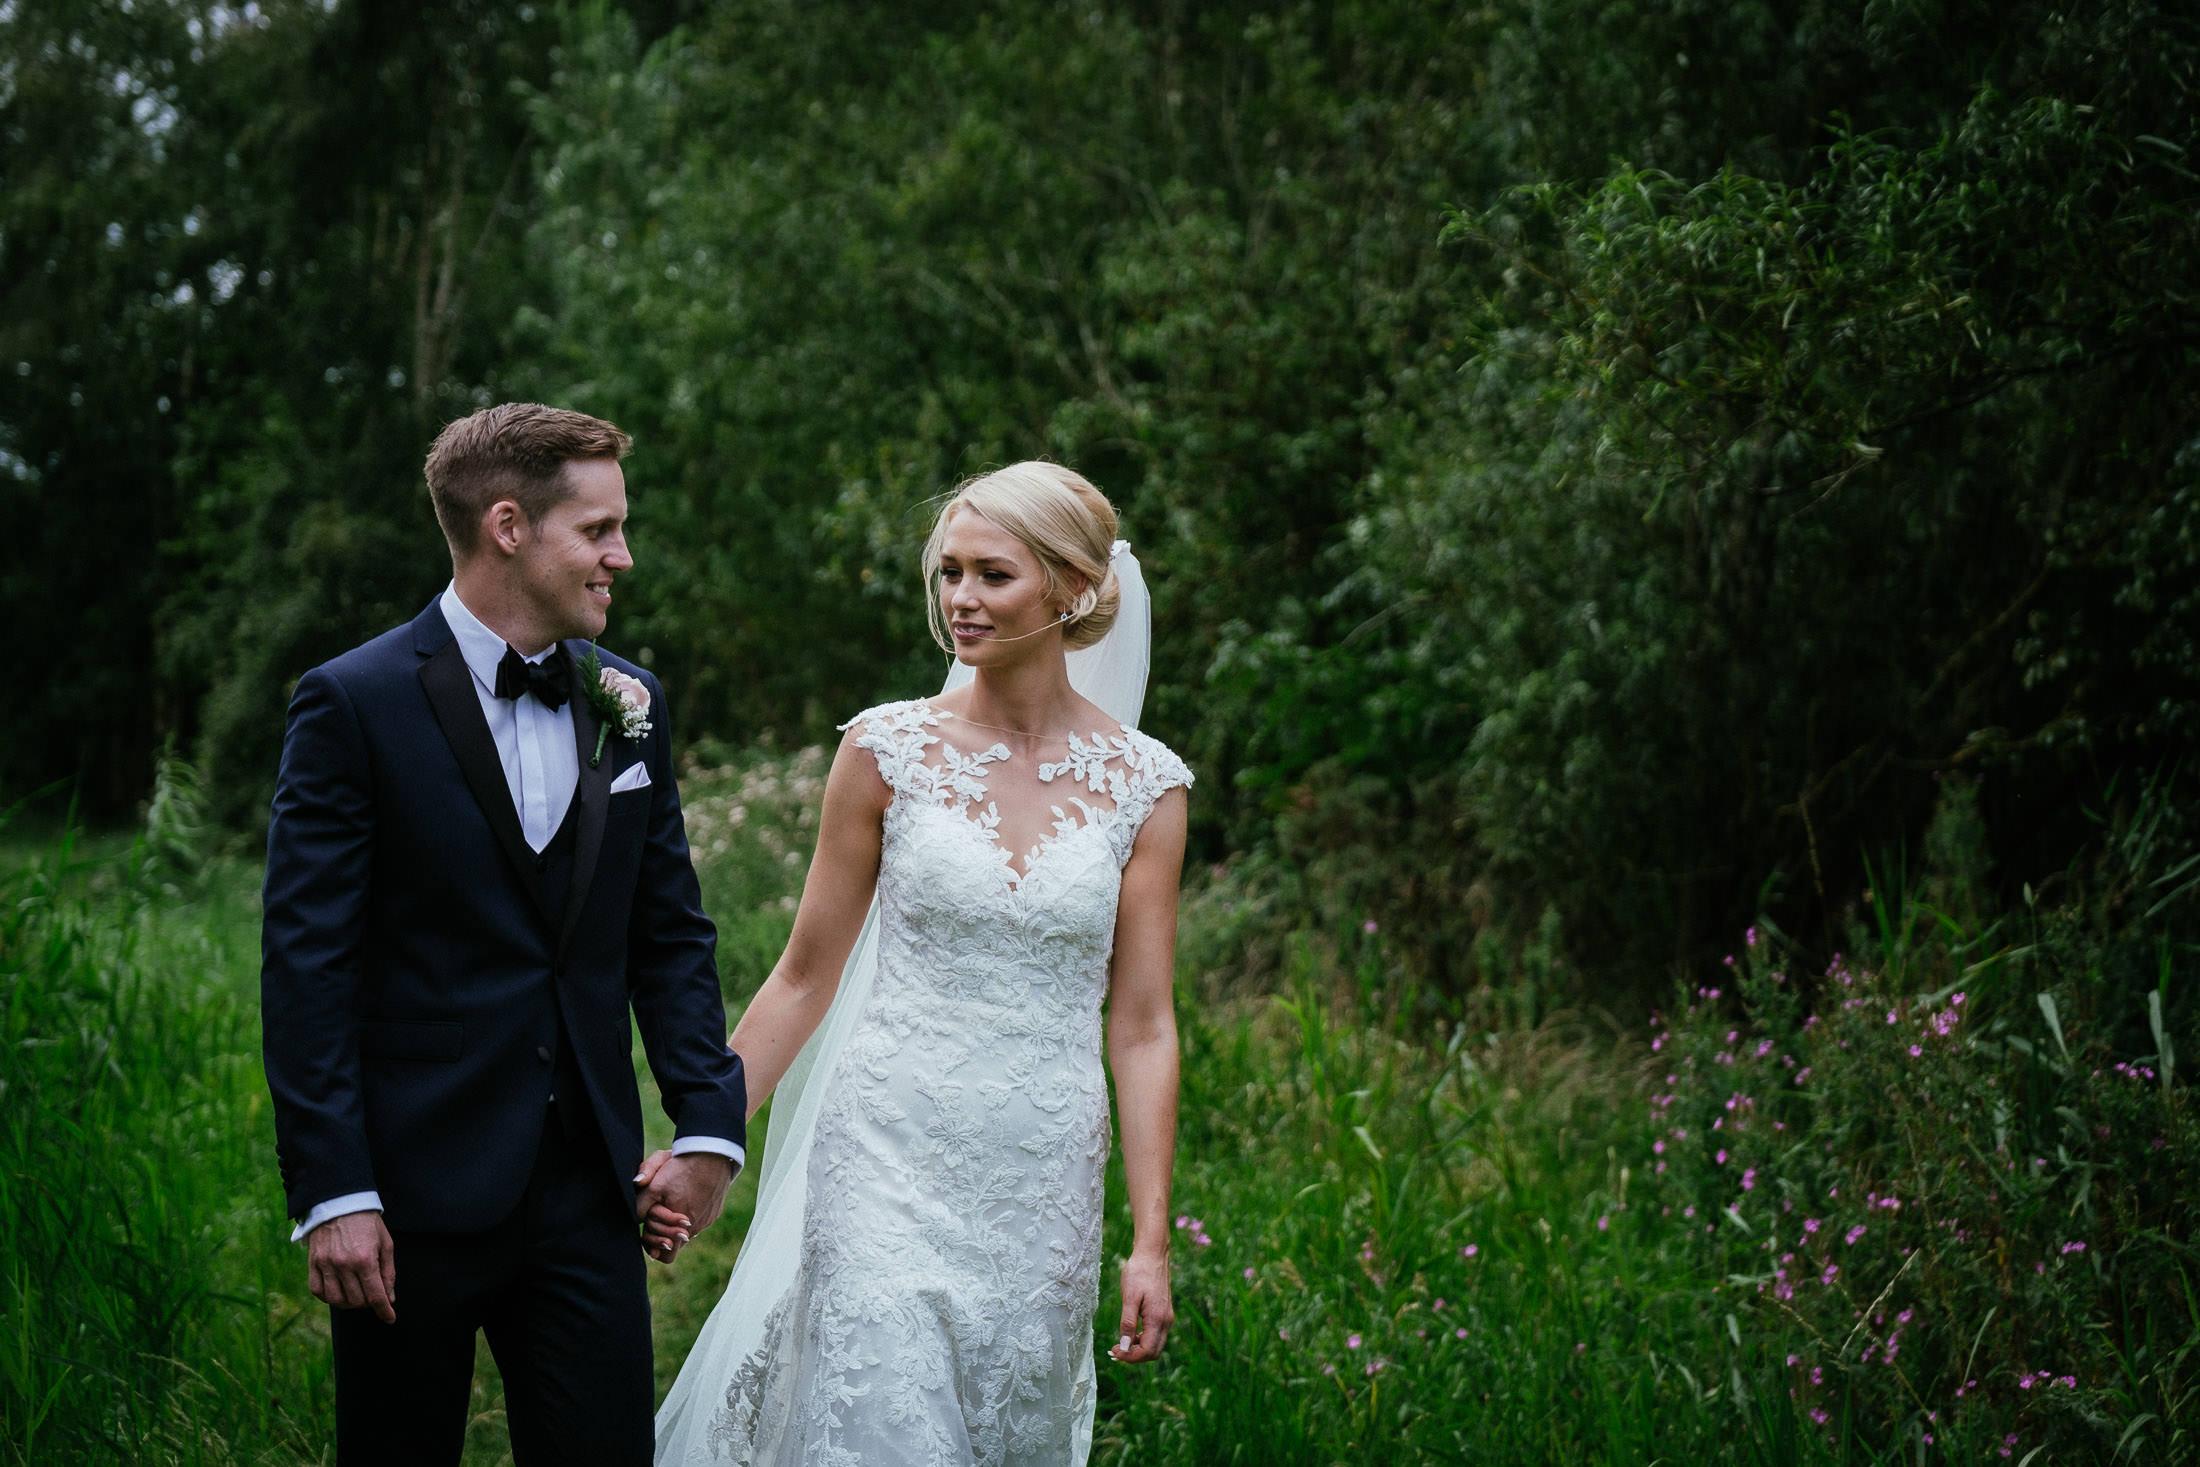 Knightsbrook Hotel Trim Castle Wedding Photographer 78